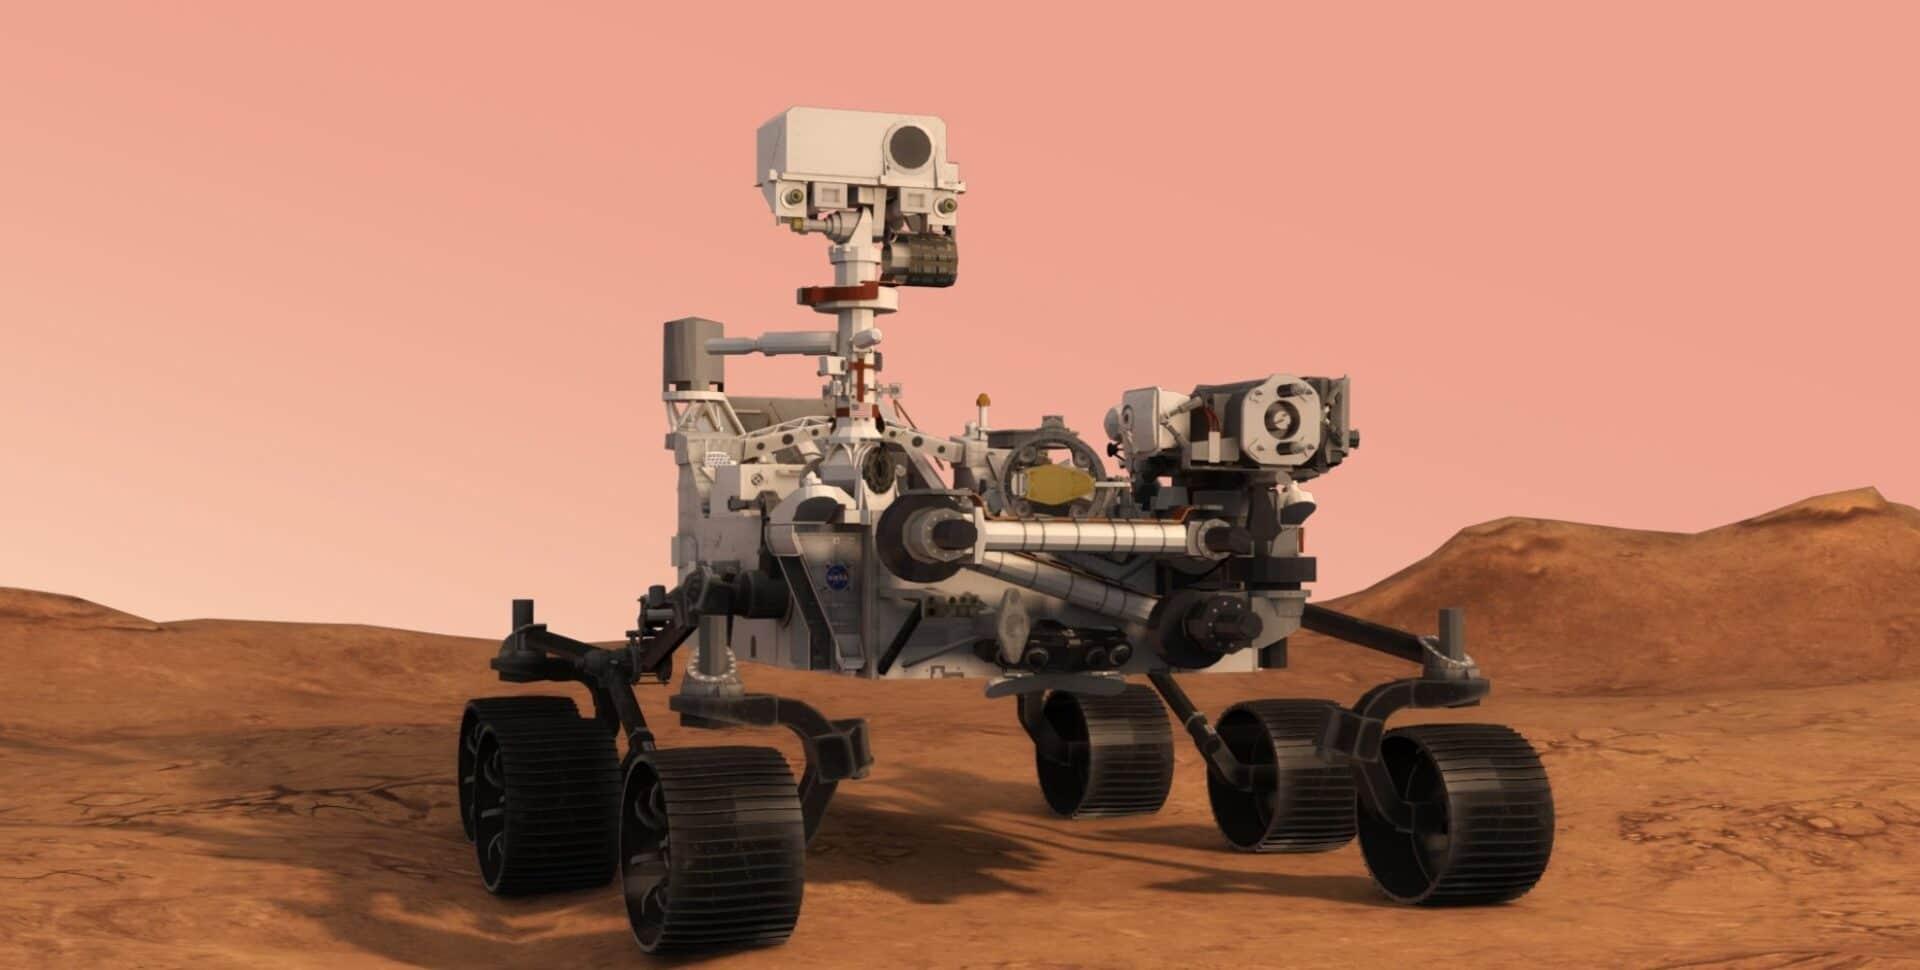 mars rover perserverance